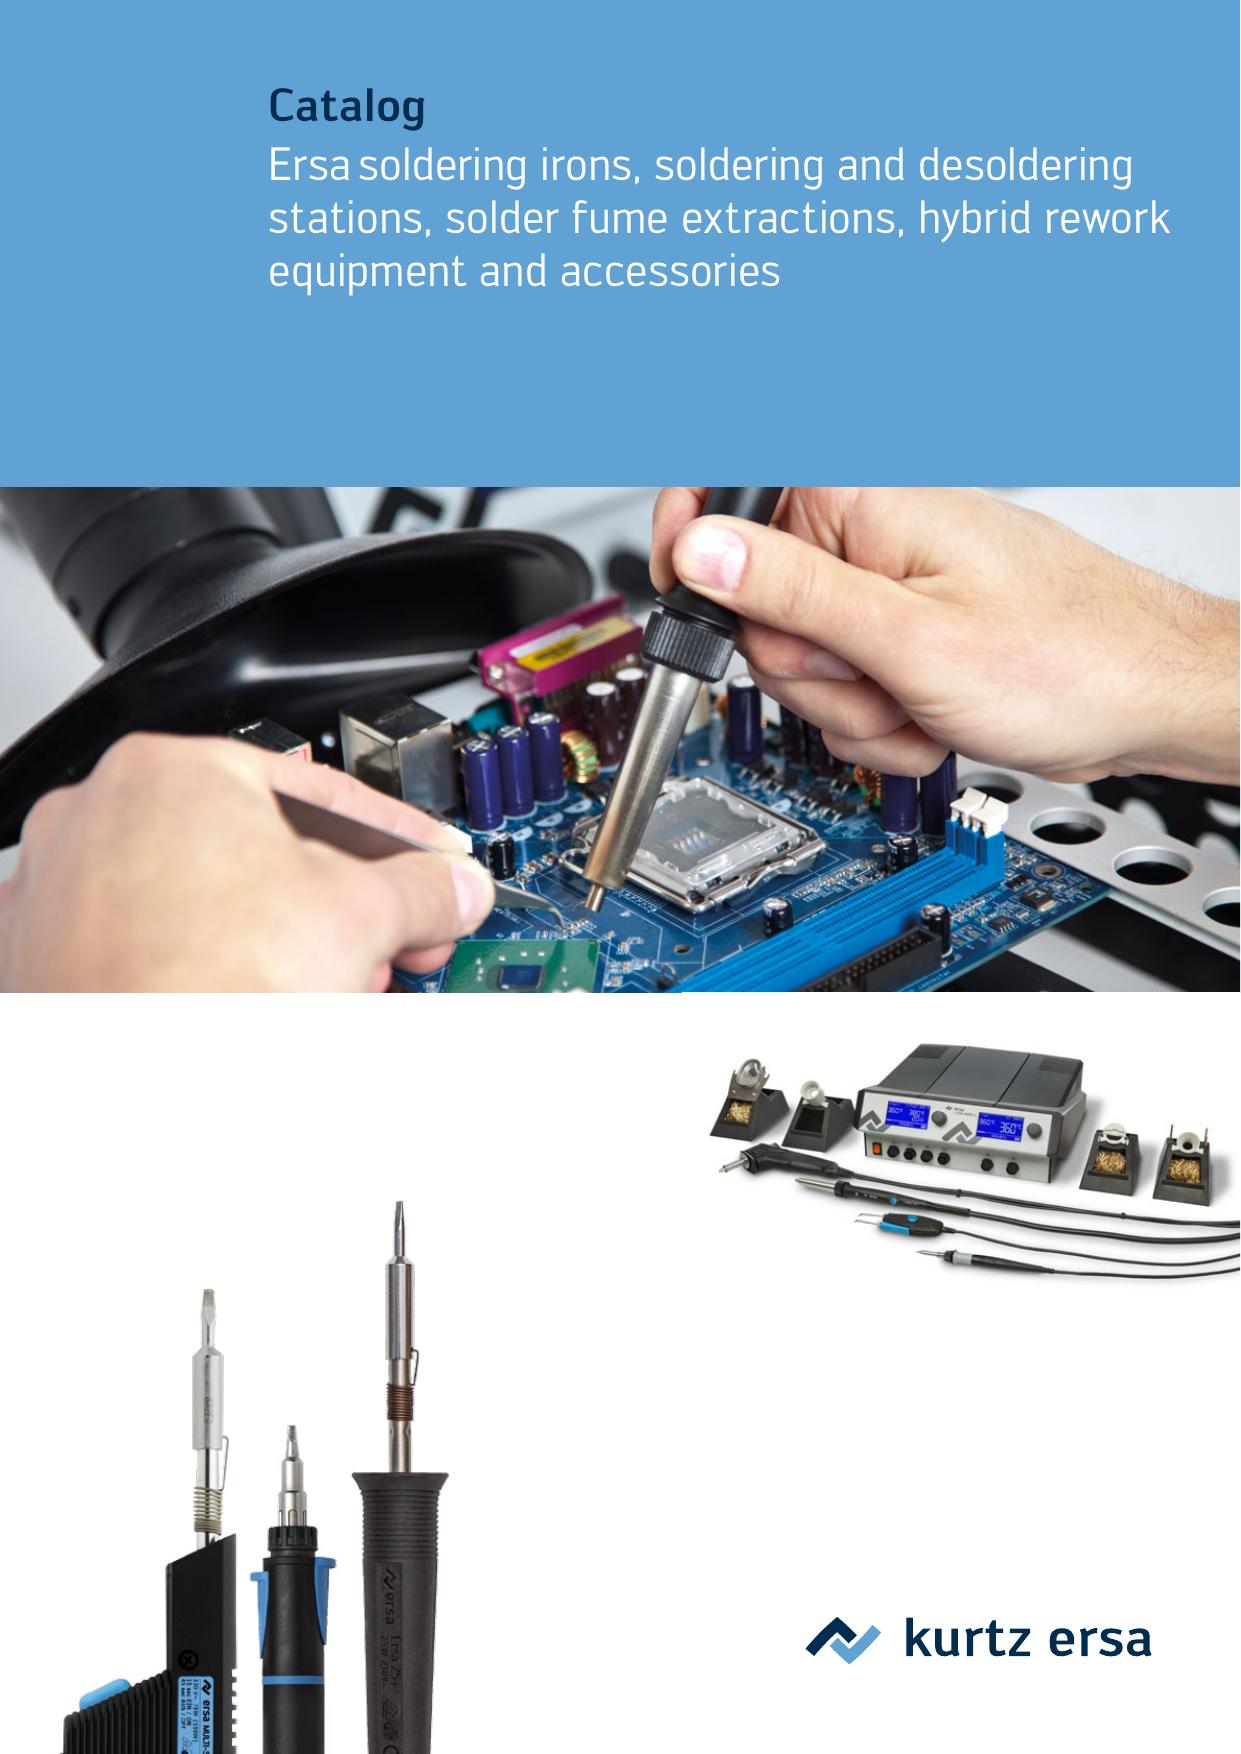 Ersa soldering tip ERSADUR 0102CDLF32//SB 3.2 mm chisel shaped lead-free